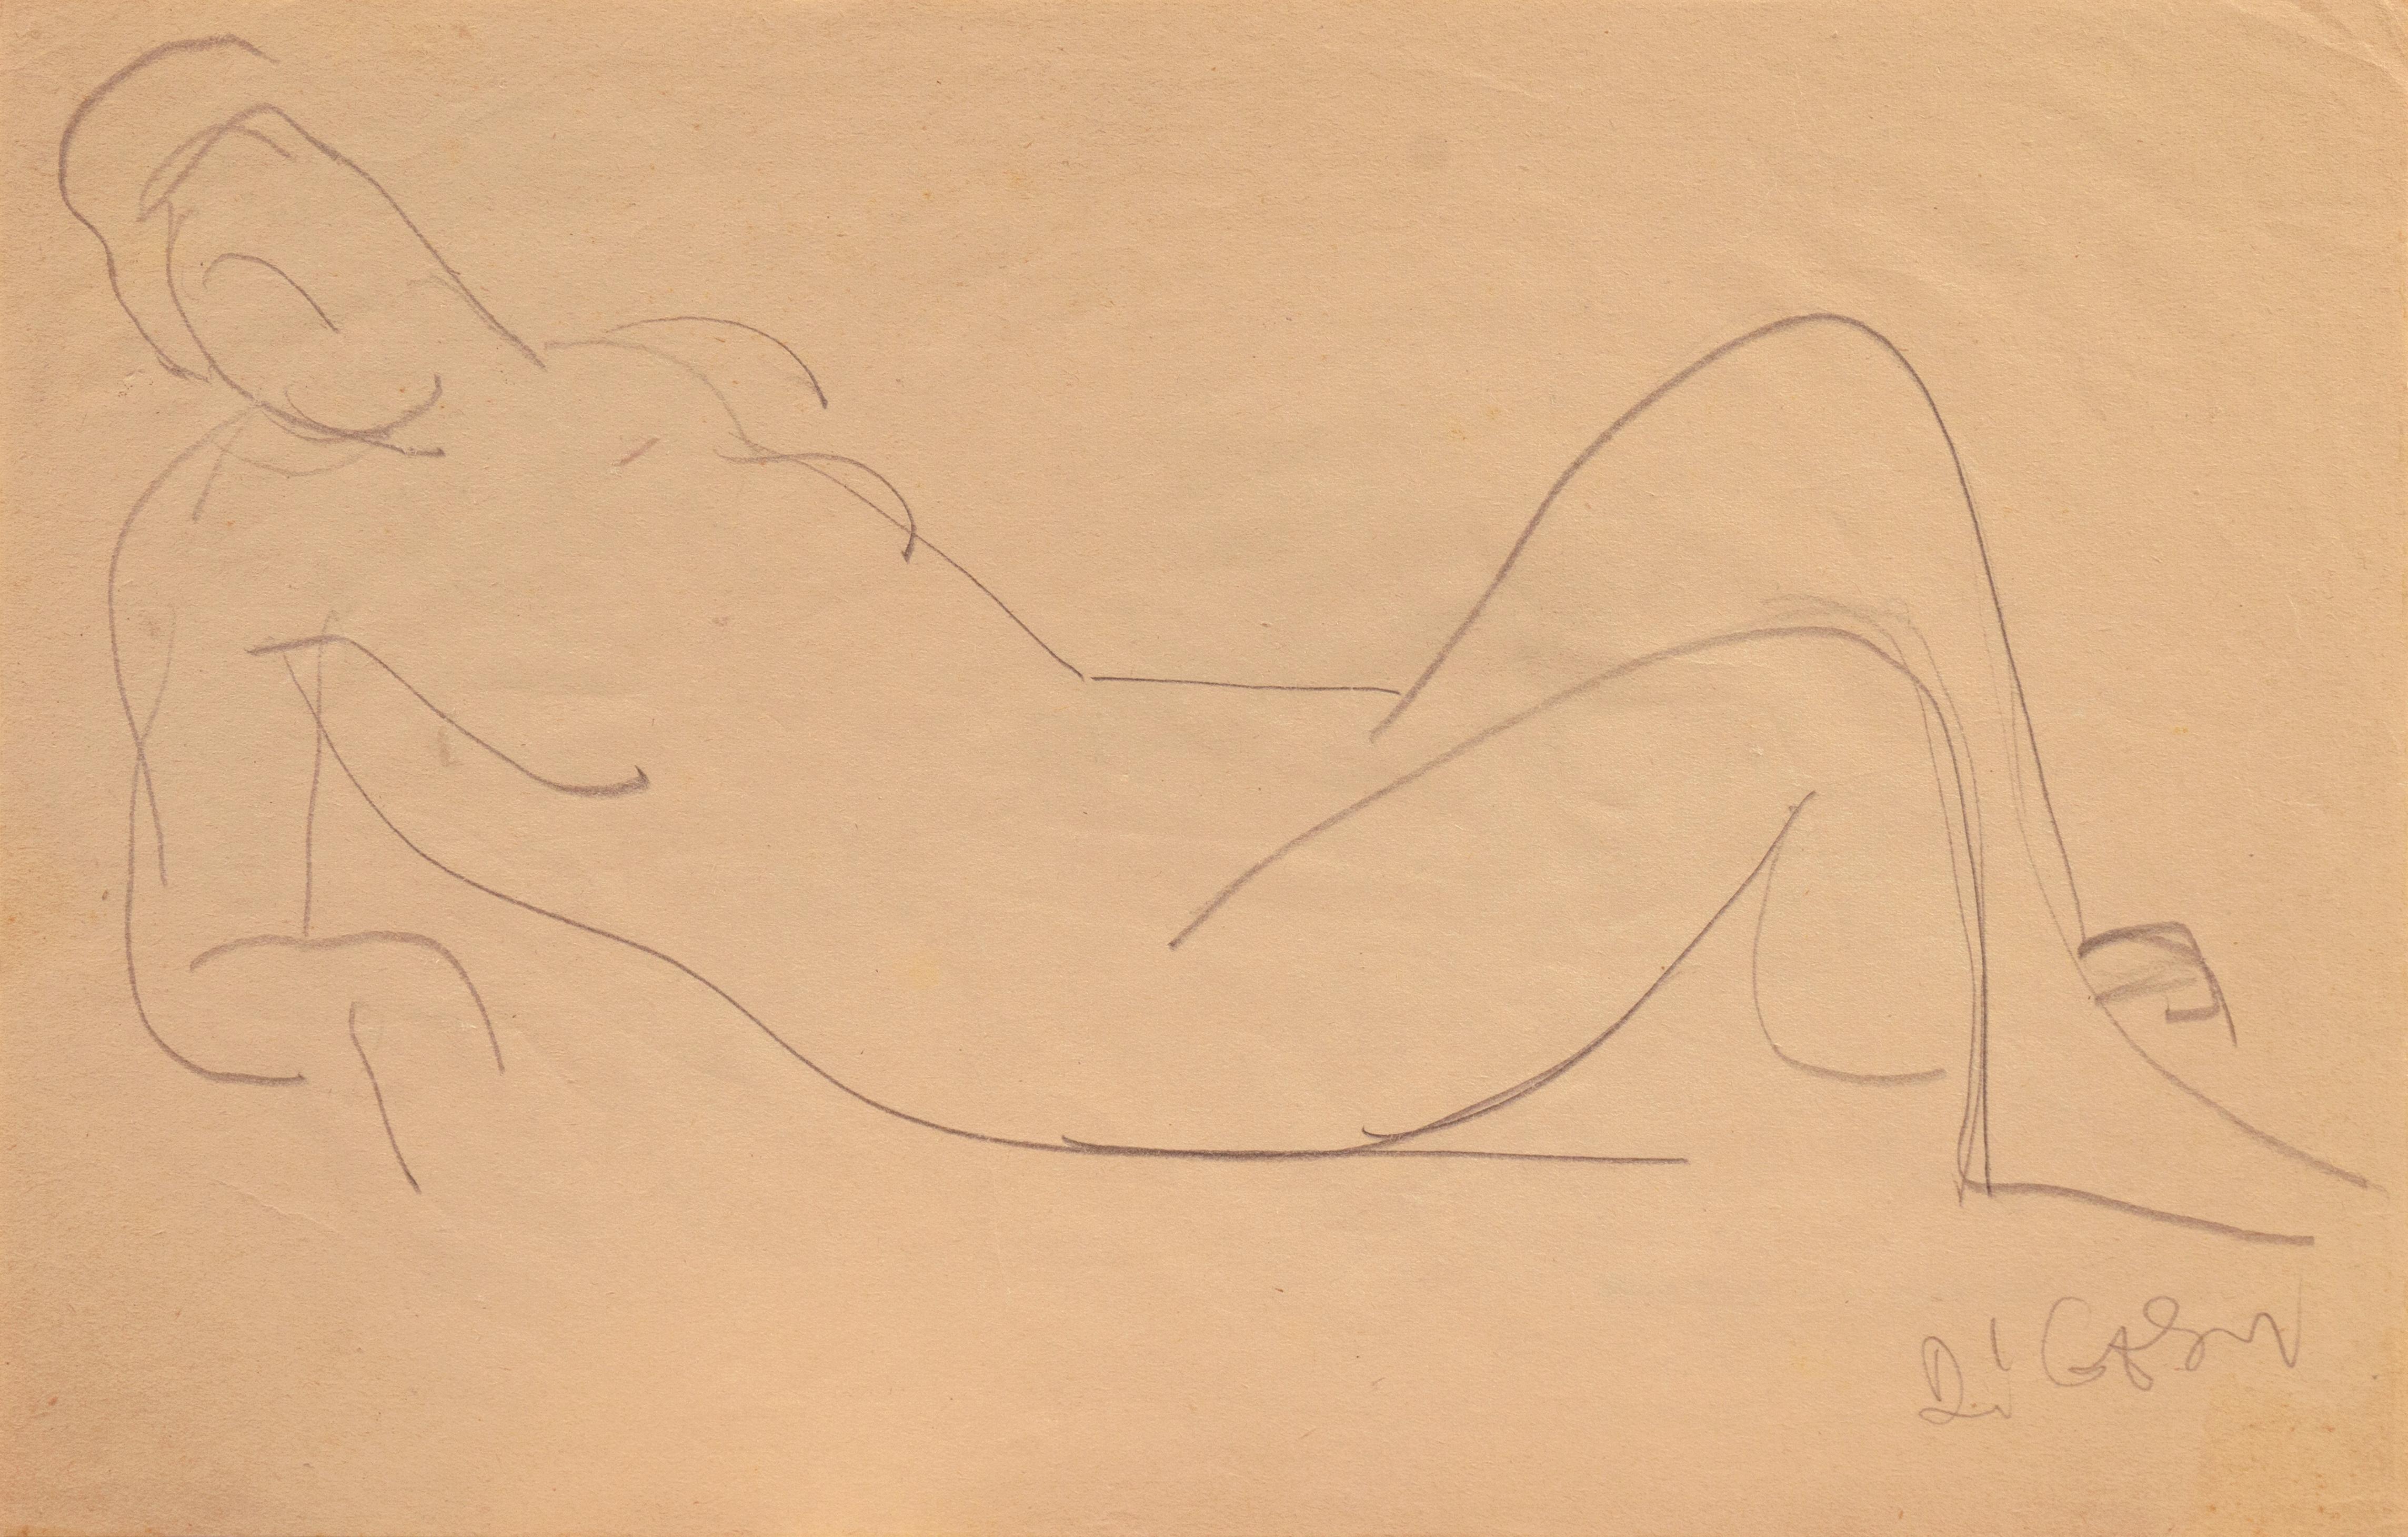 California Post-Impressionist 'Reclining Nude' Louvre, Académie Chaumière, LACMA